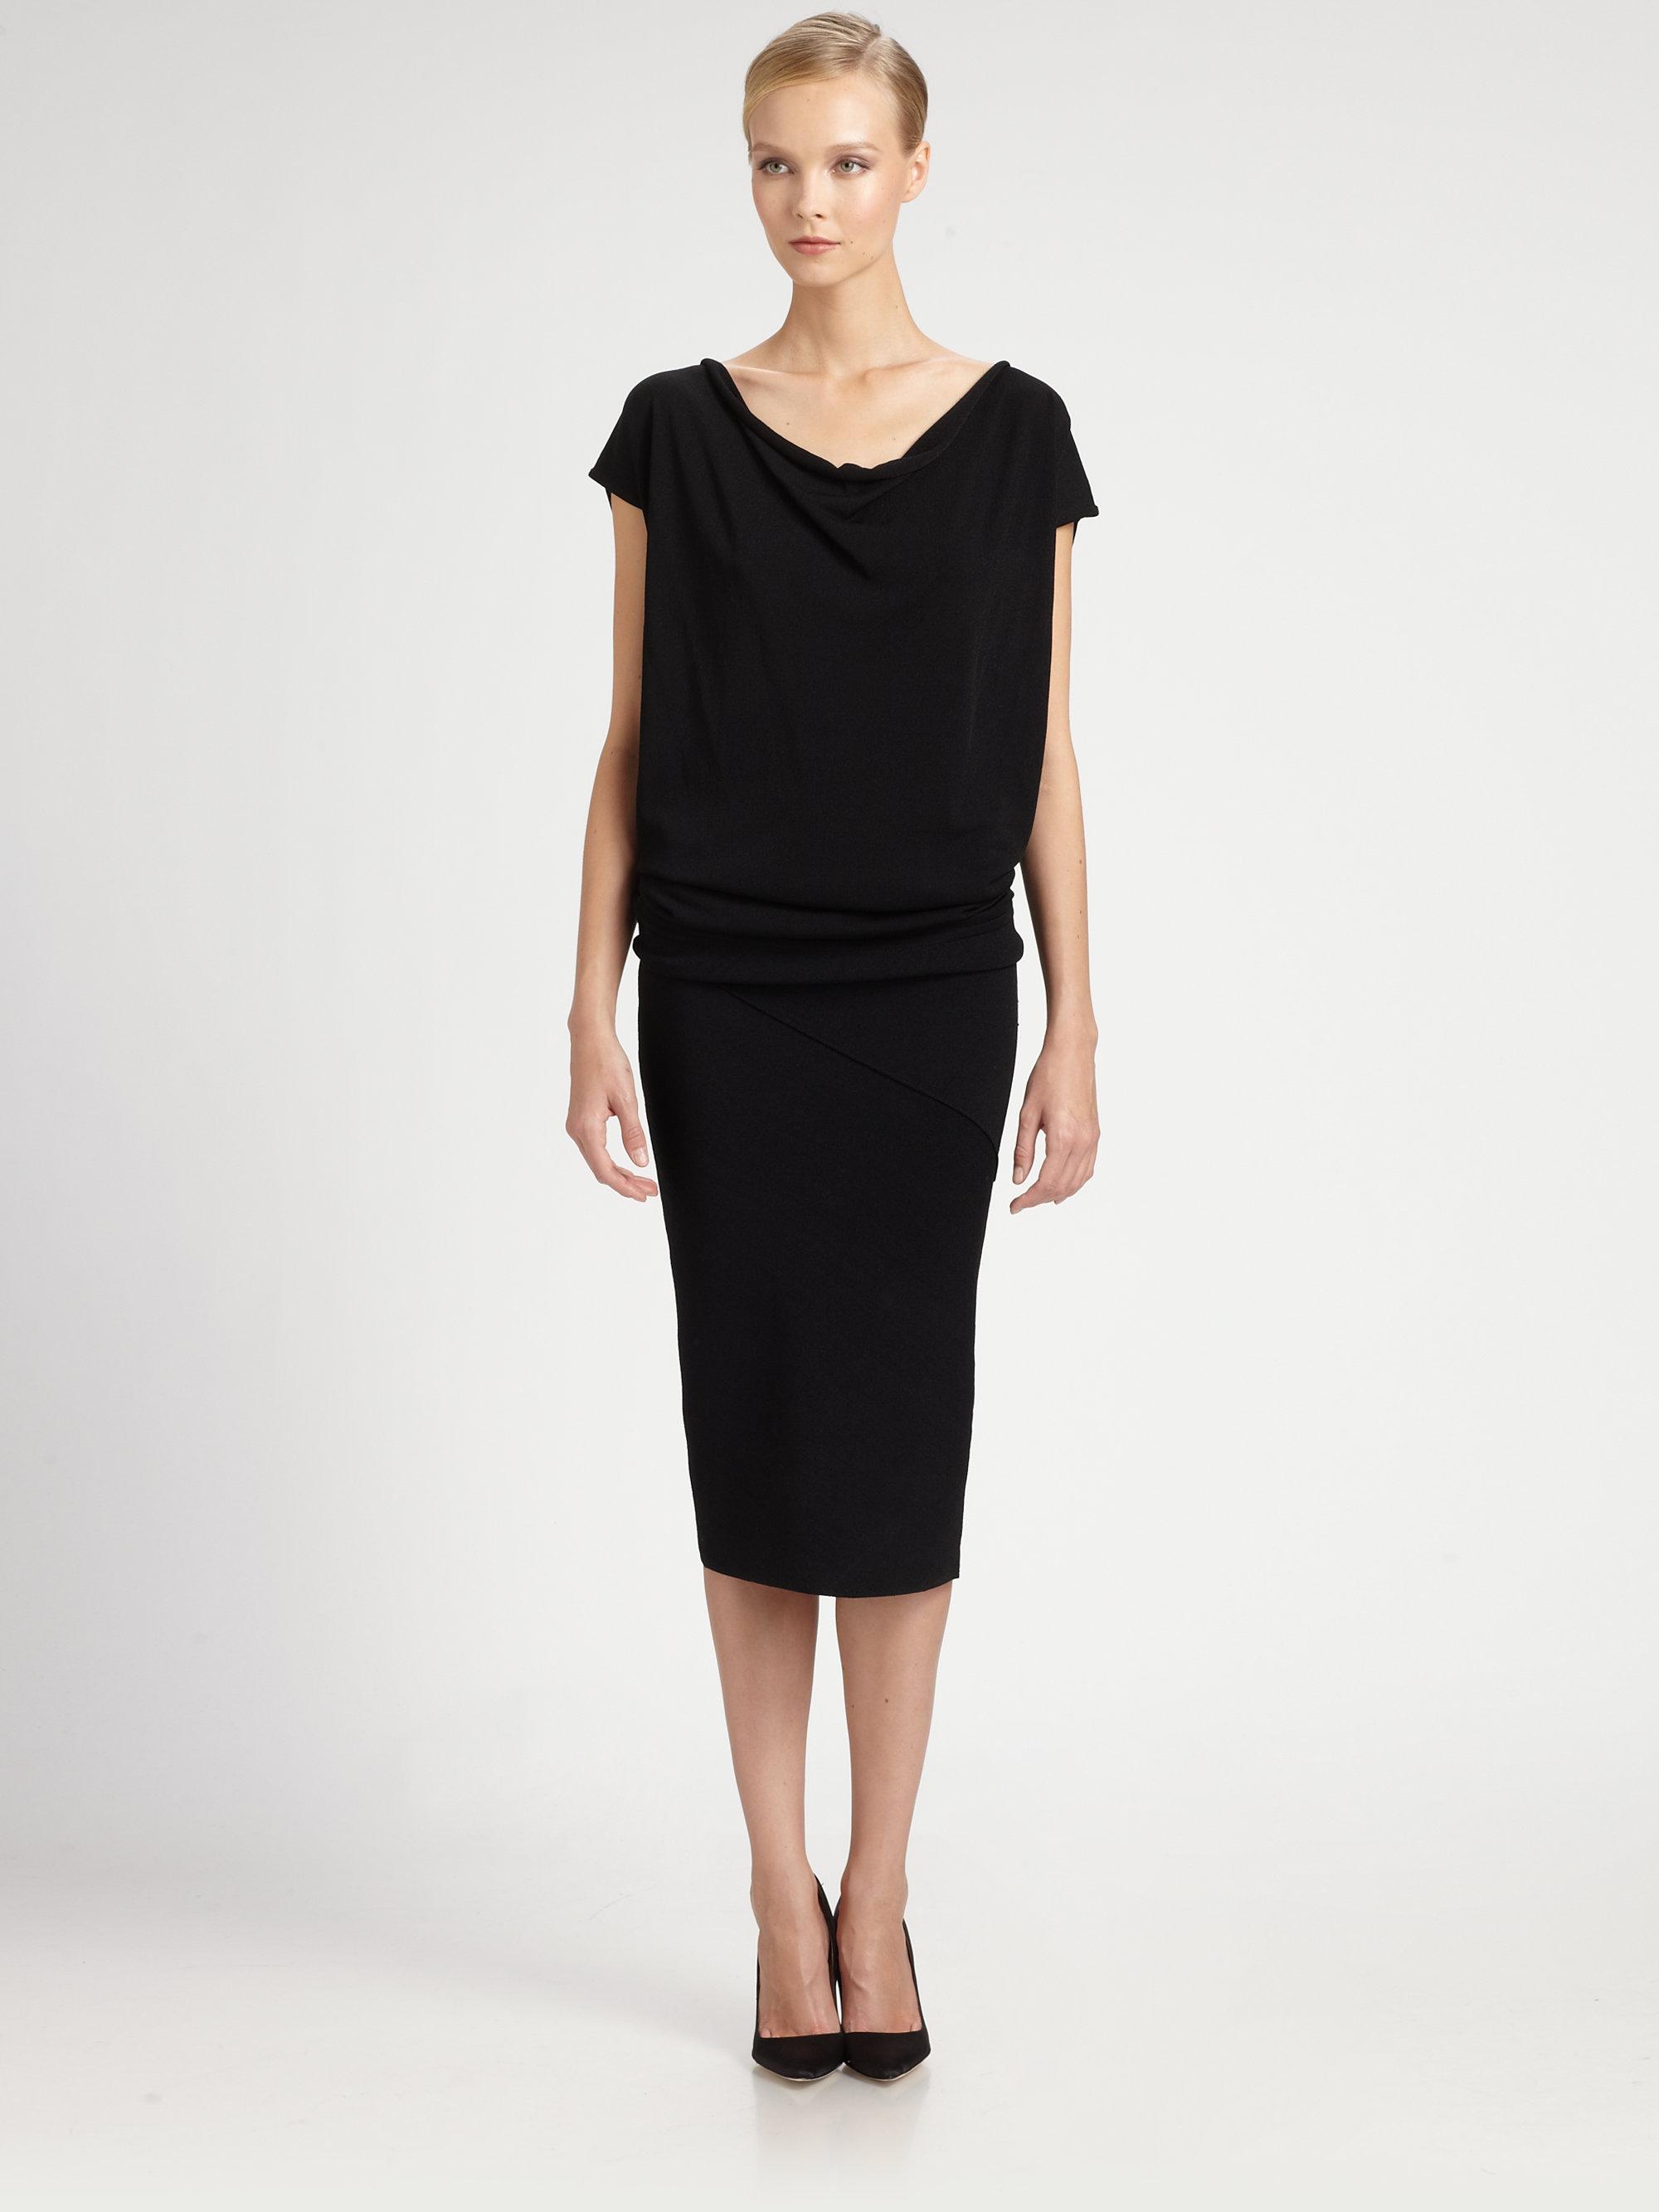 Donna karan new york drape front dress in black lyst for Donna karan new york